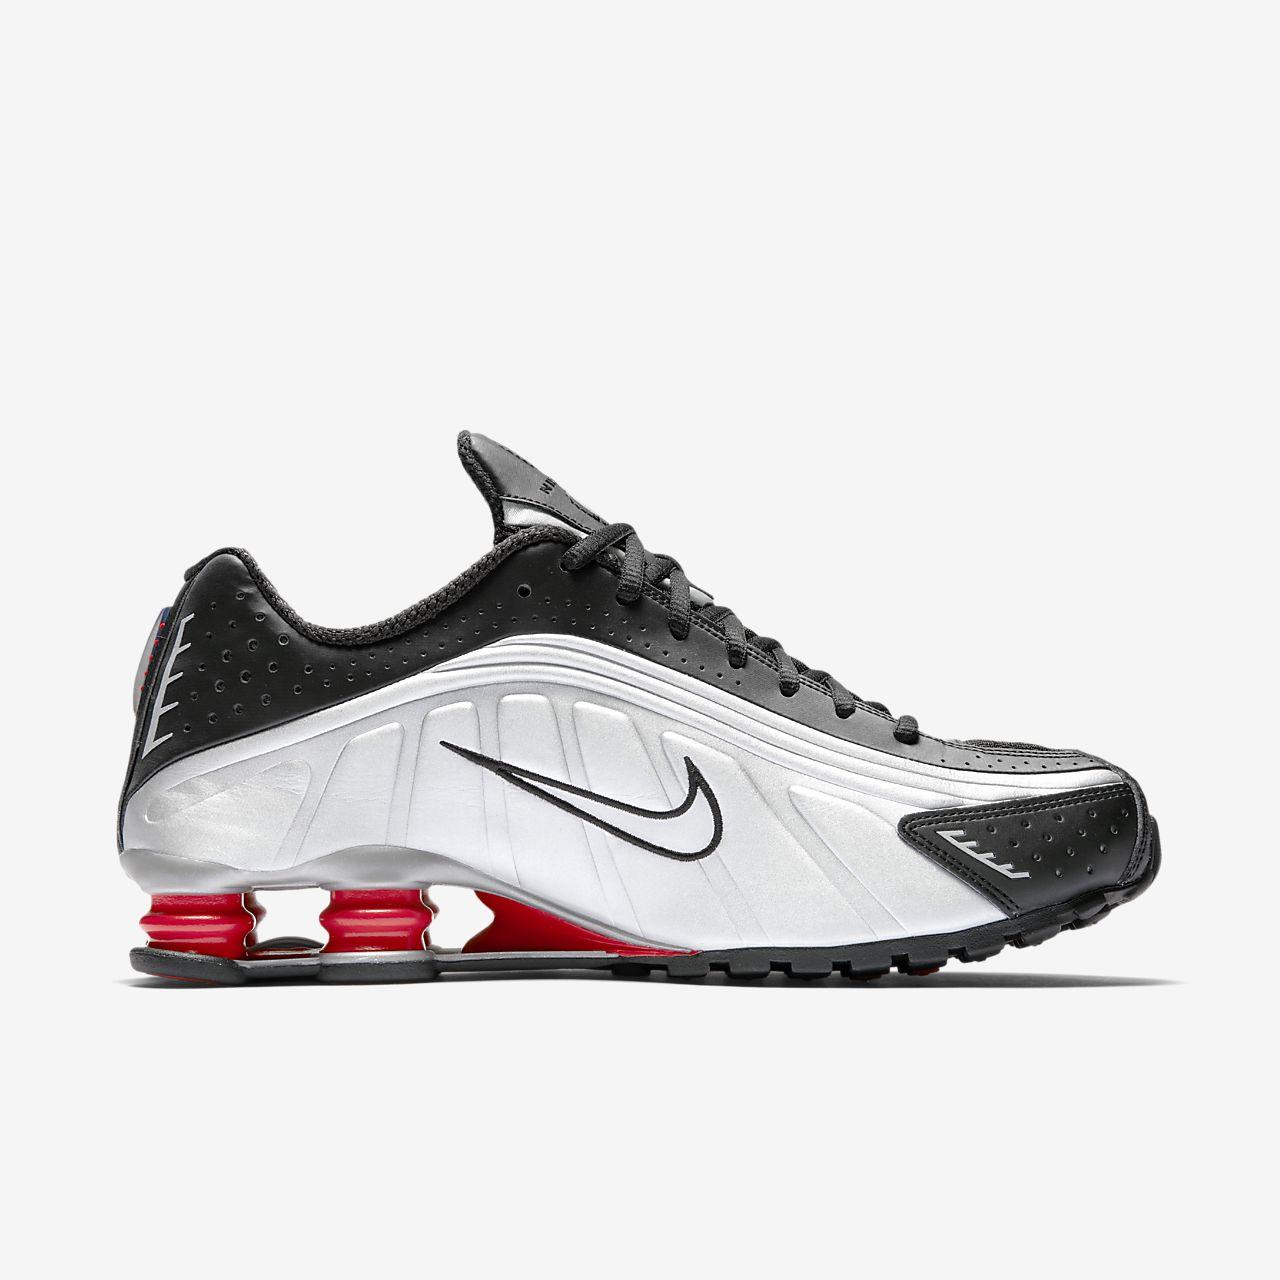 on sale 4956b 75448 Low Resolution Sapatilhas Nike Shox R4 Sapatilhas Nike Shox R4